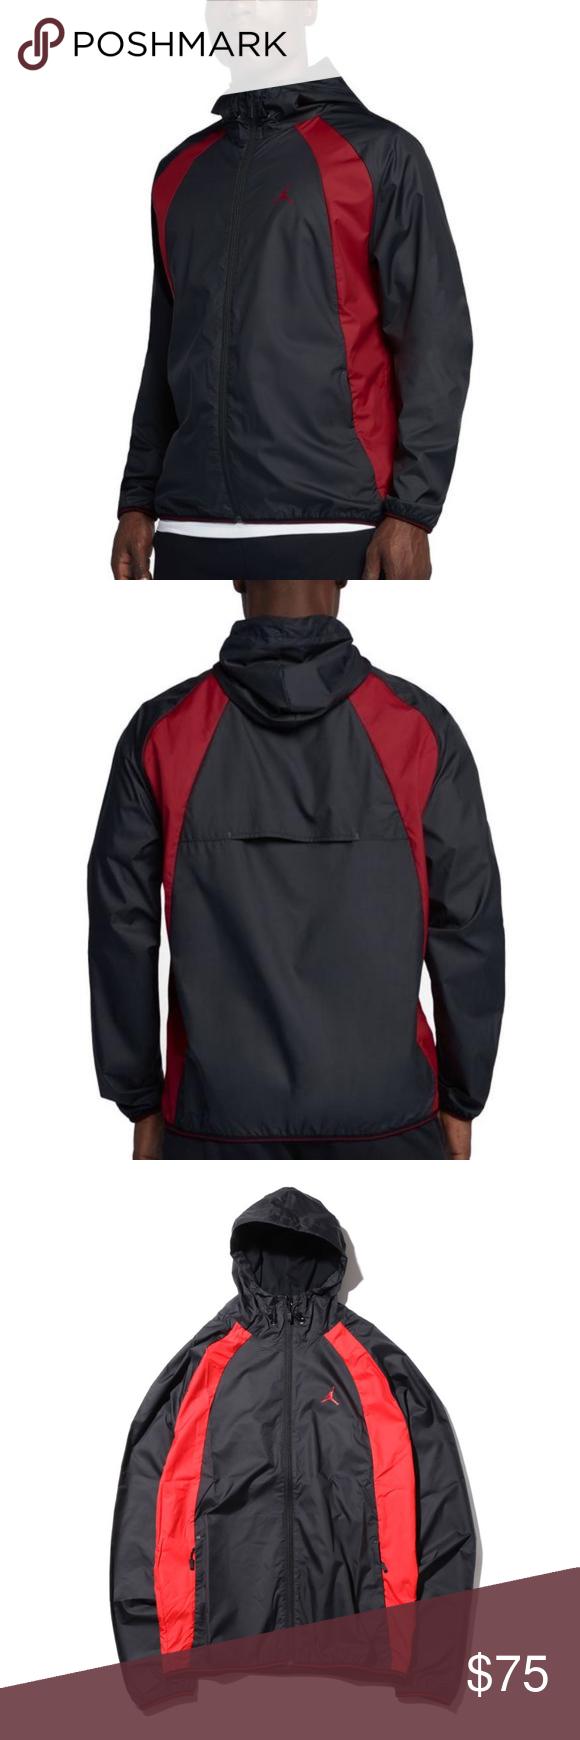 beca9765086017 Nike AIR JORDAN WINGS Windbreaker Men s Jacket The Jordan Sportswear Wings  Windbreaker Men s Jacket features a